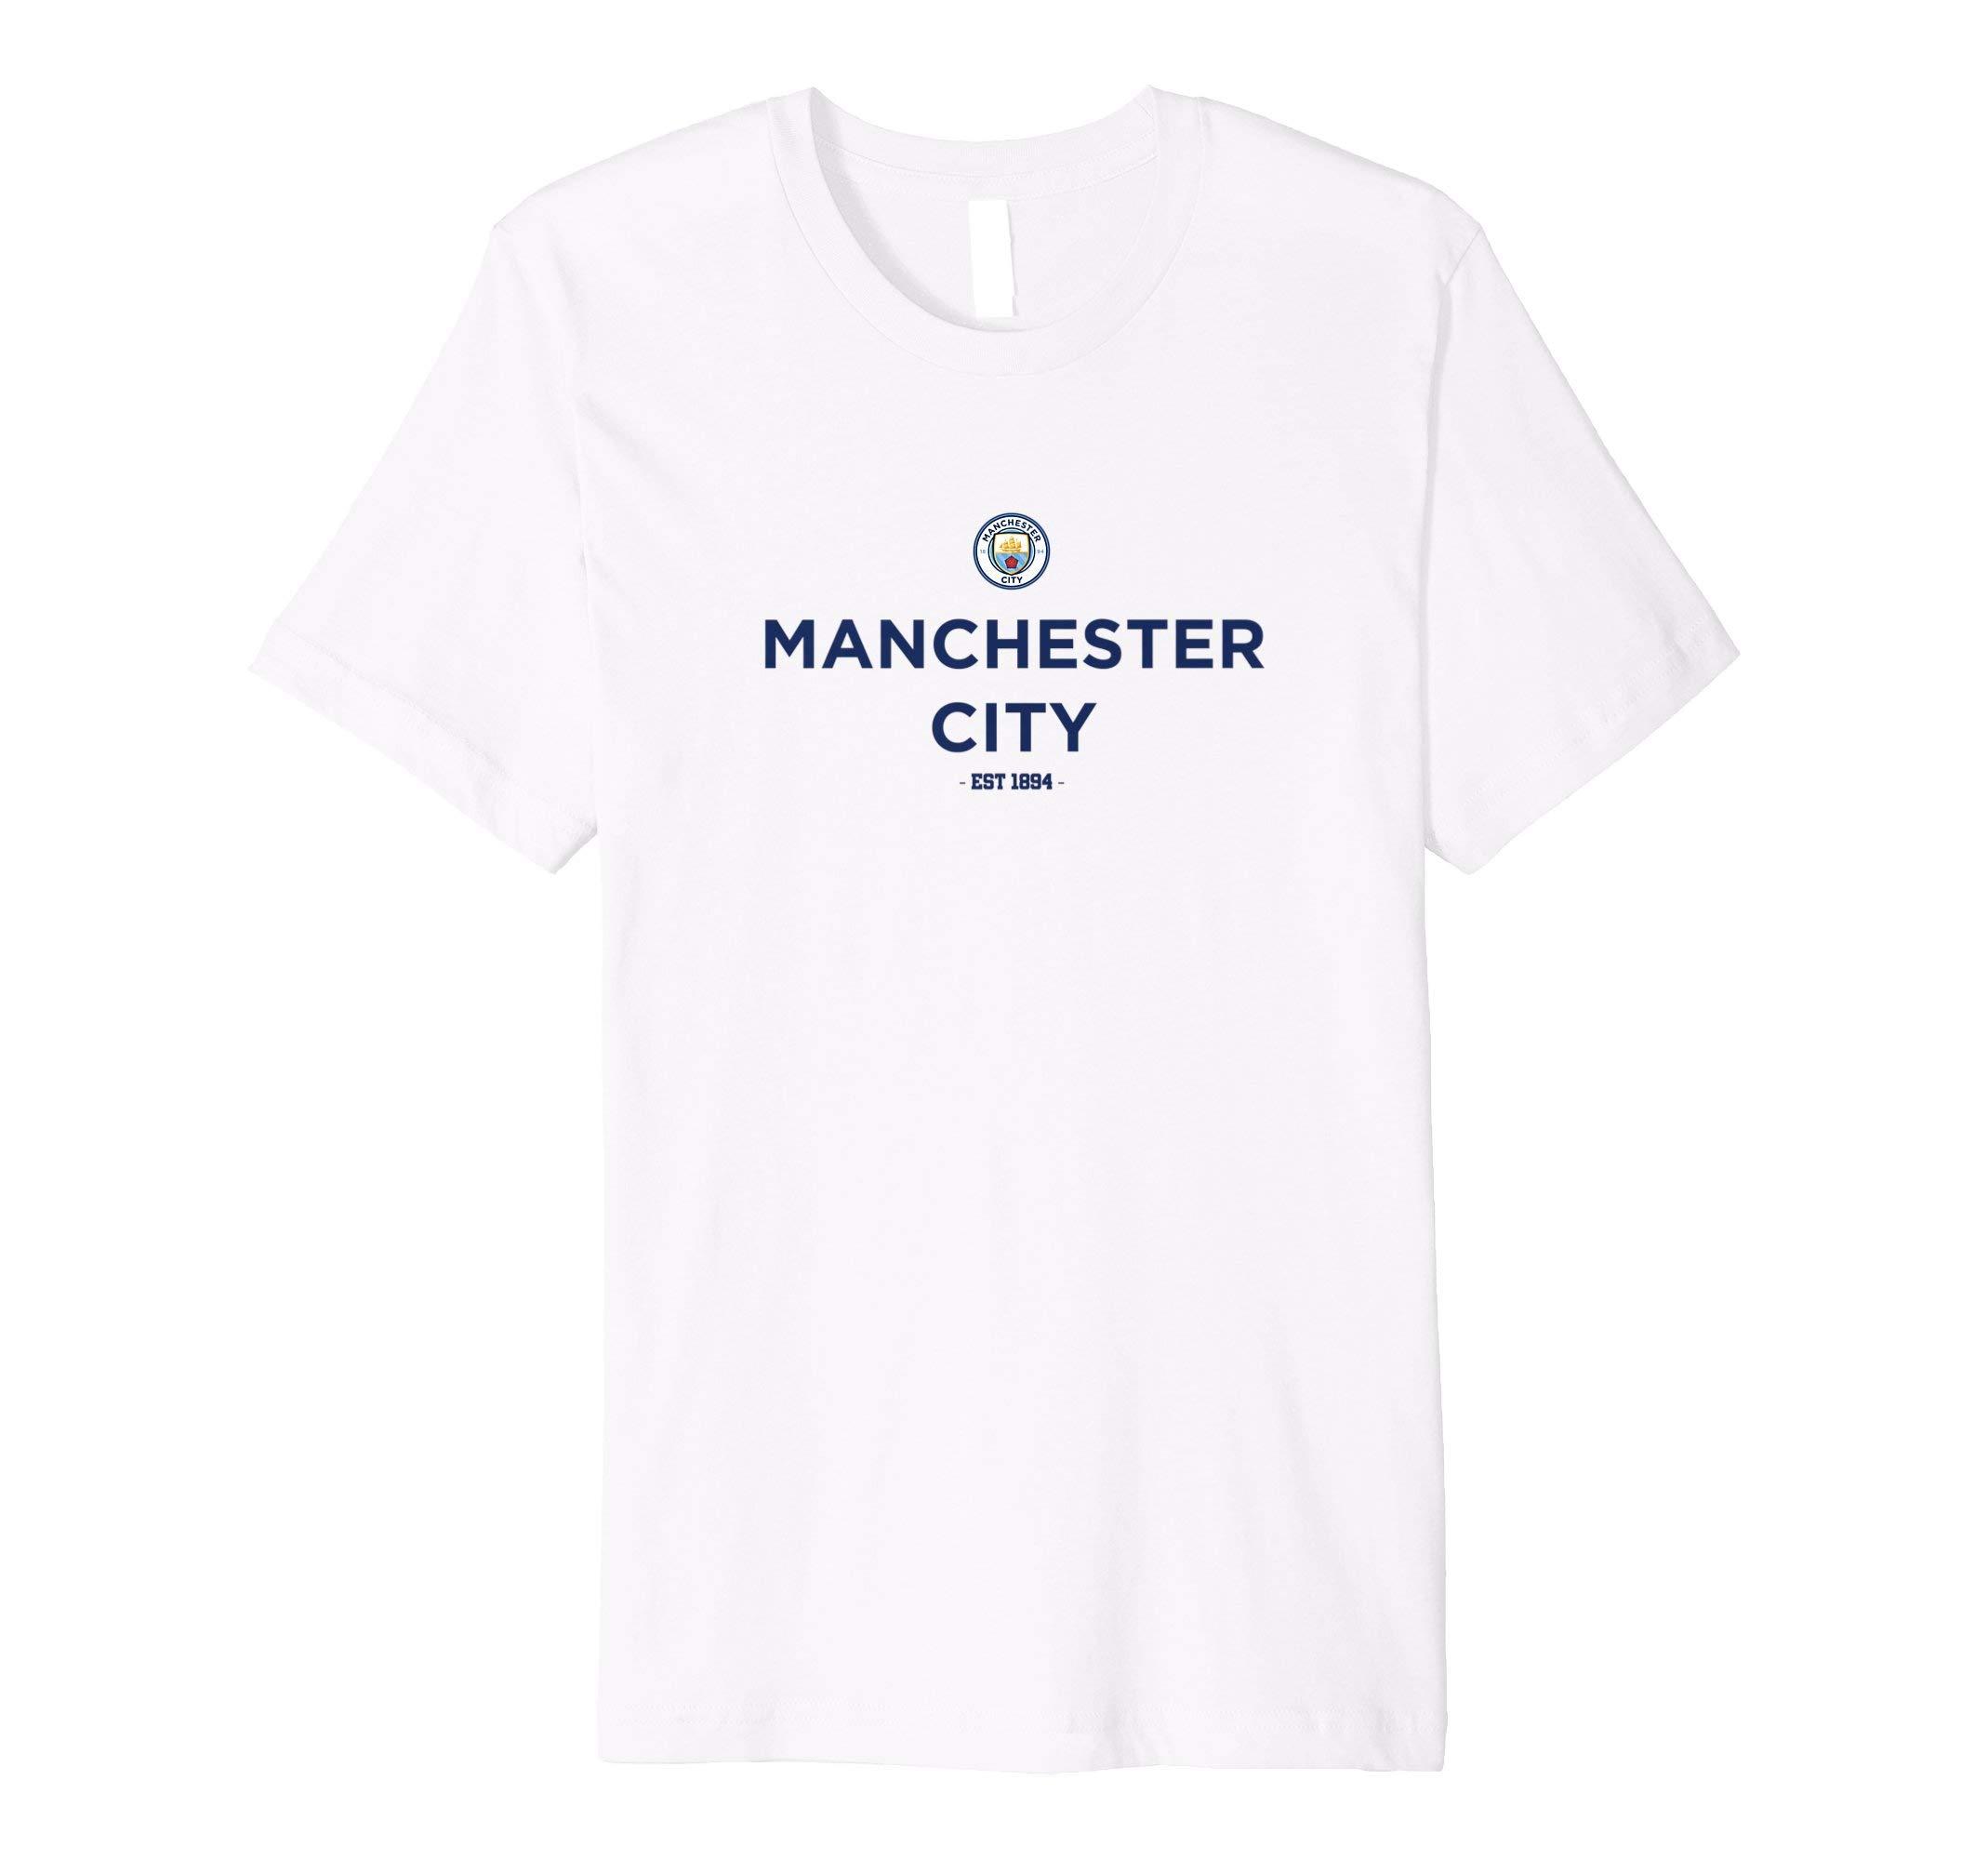 d4034dd980e Amazon.co.uk  Manchester City  Fashion